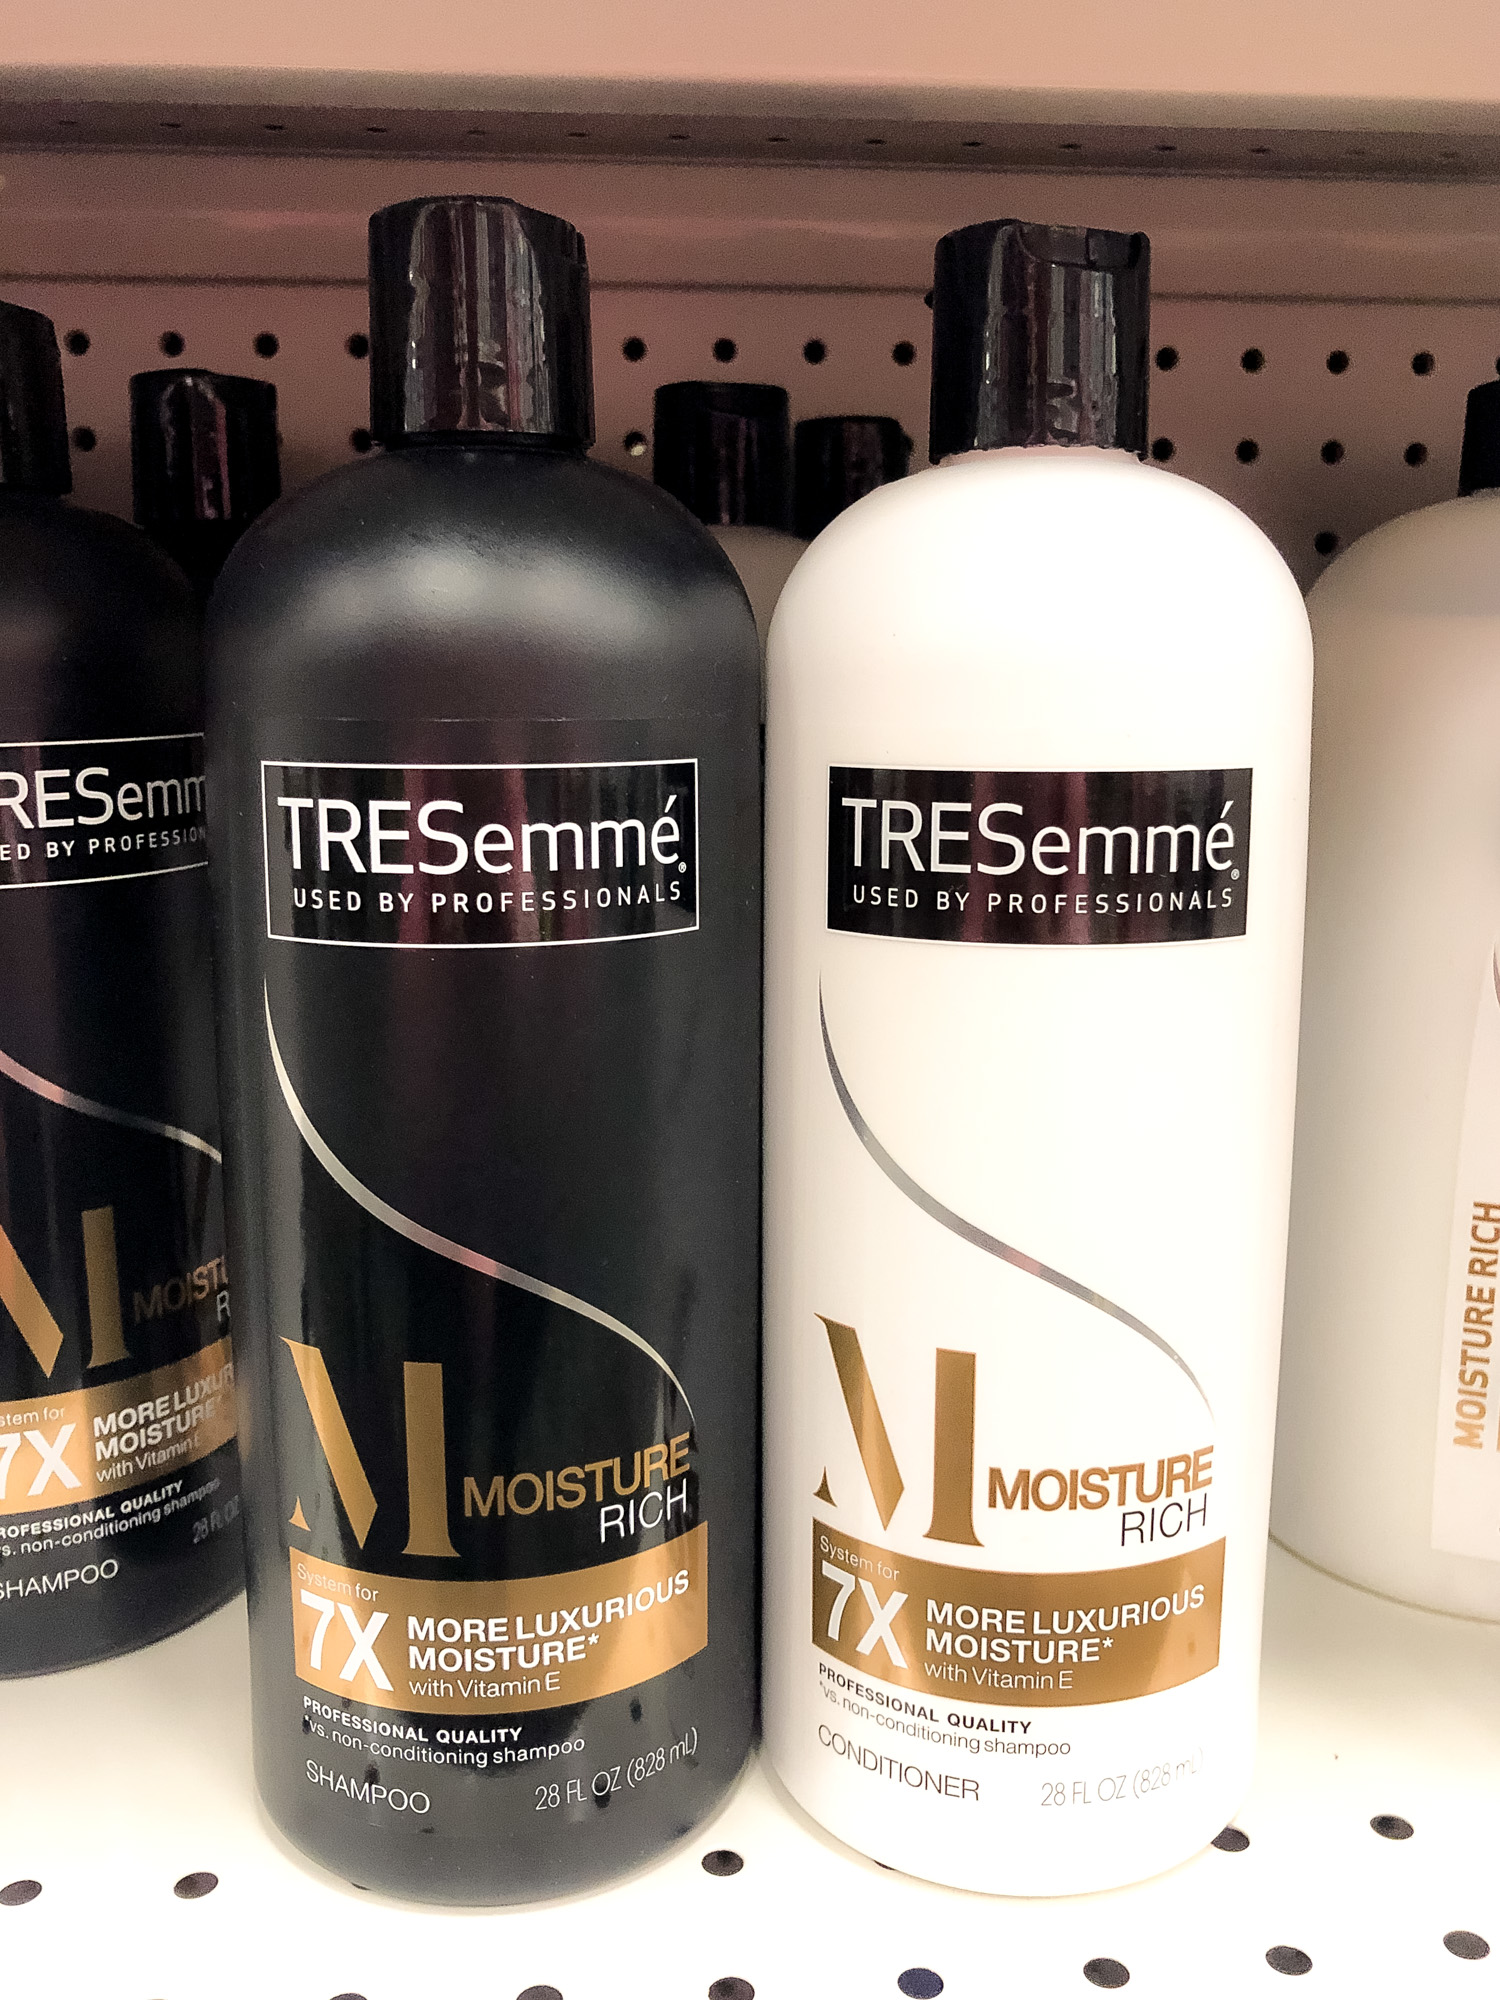 TRESemmé® Moisture Rich Shampoo and Conditioner